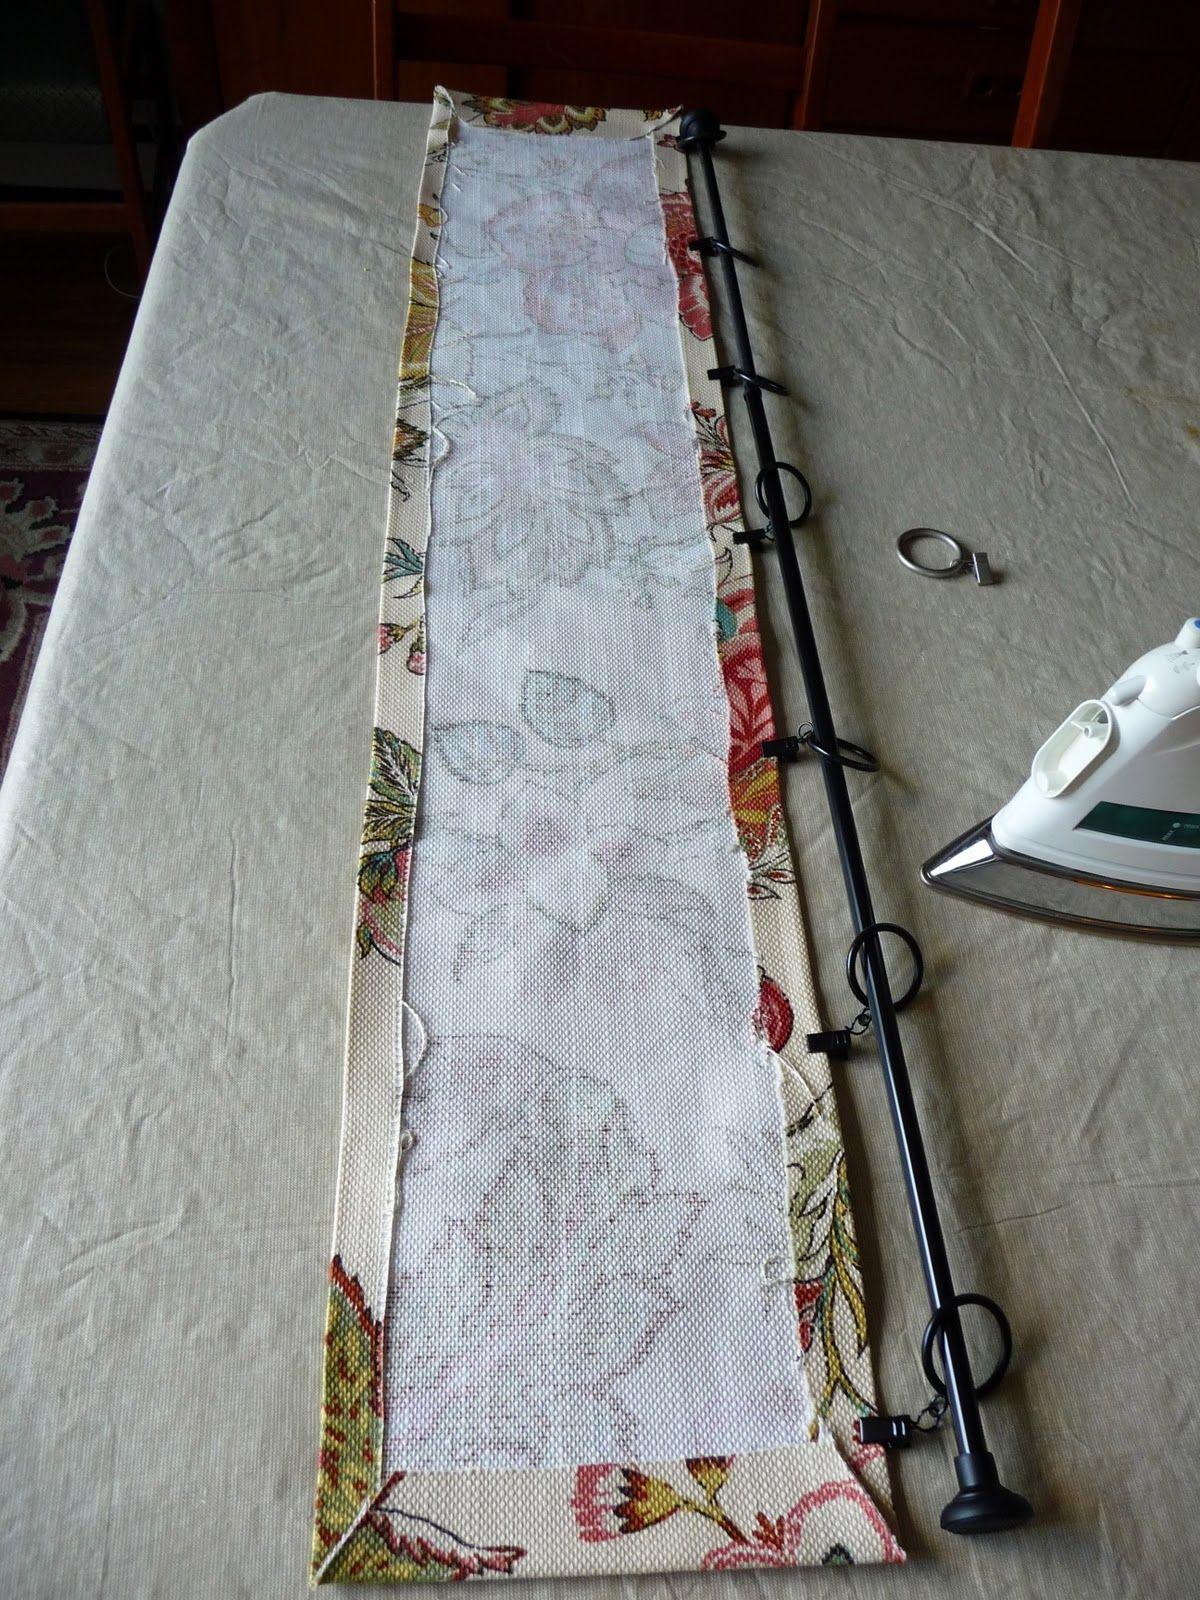 No-sew hanging valance tutorial | House | Pinterest ...